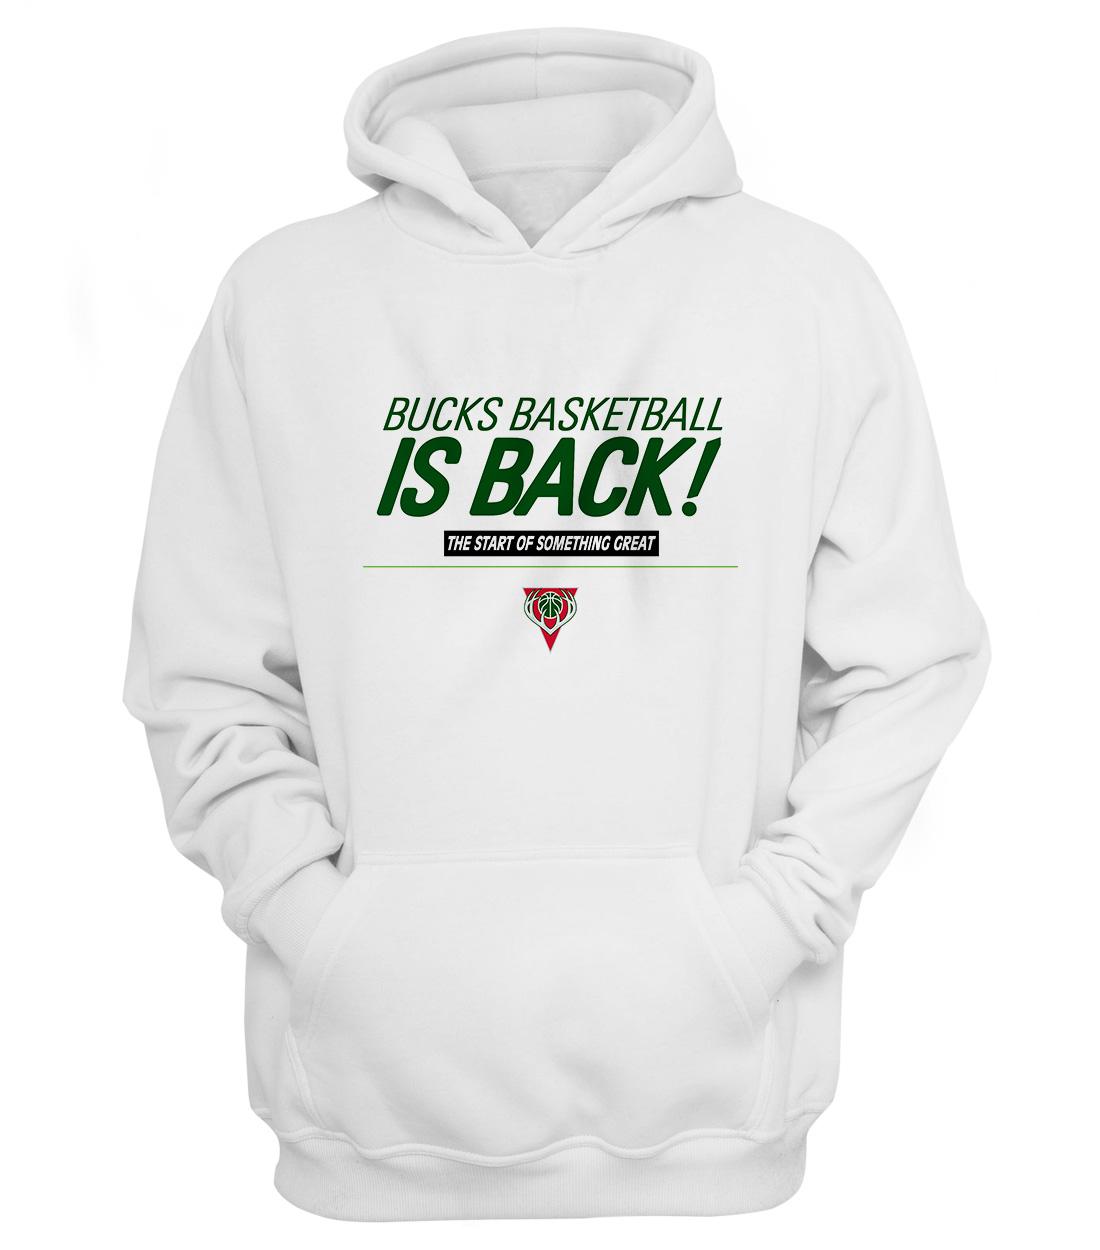 Bucks Basketball Is Back Hoodie (HD-WHT-NP-bucks-ısback01-544)